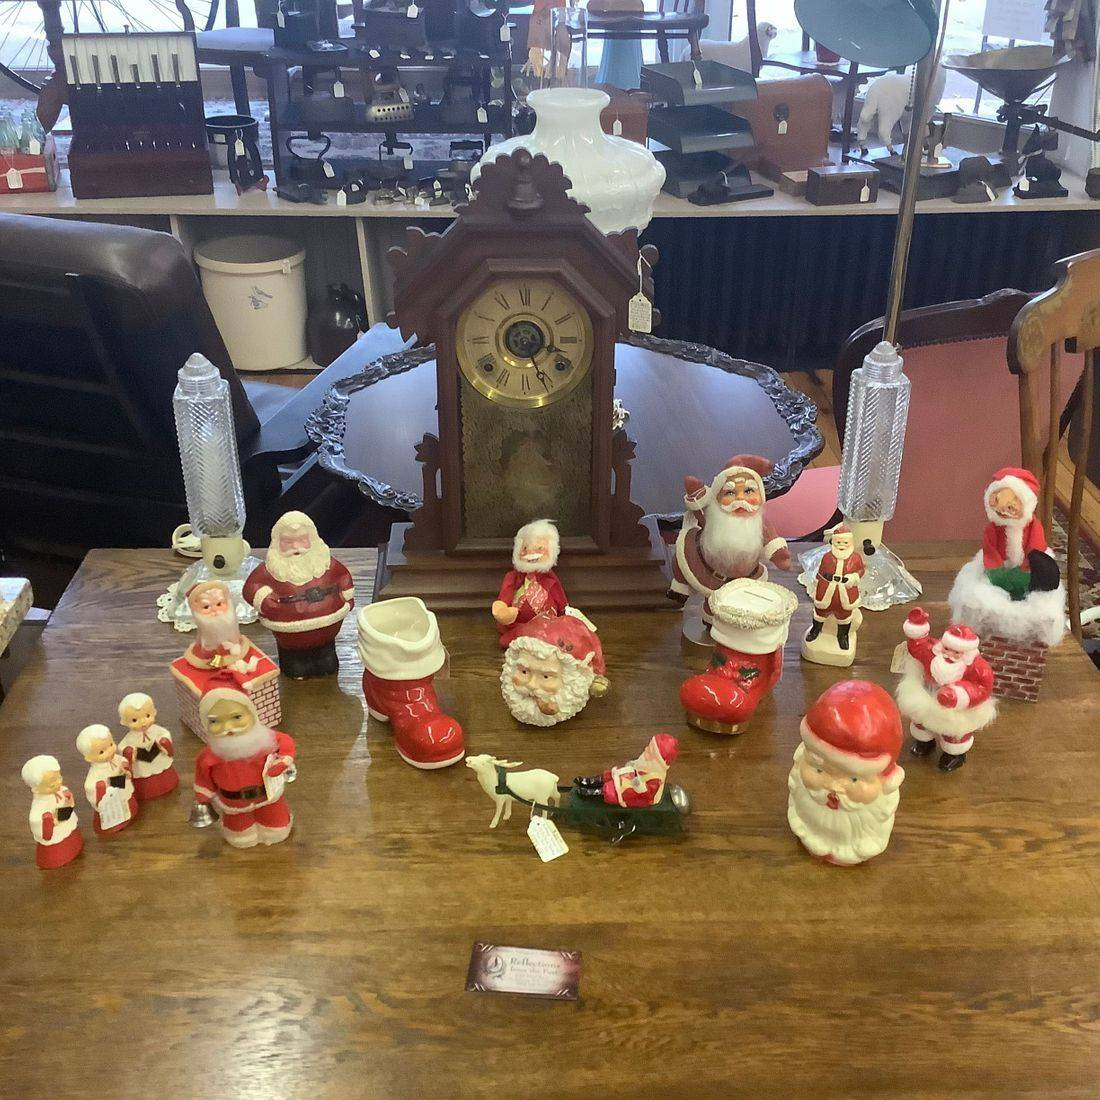 Vintage Santa Clause Decorations   $9.00 to $45.00